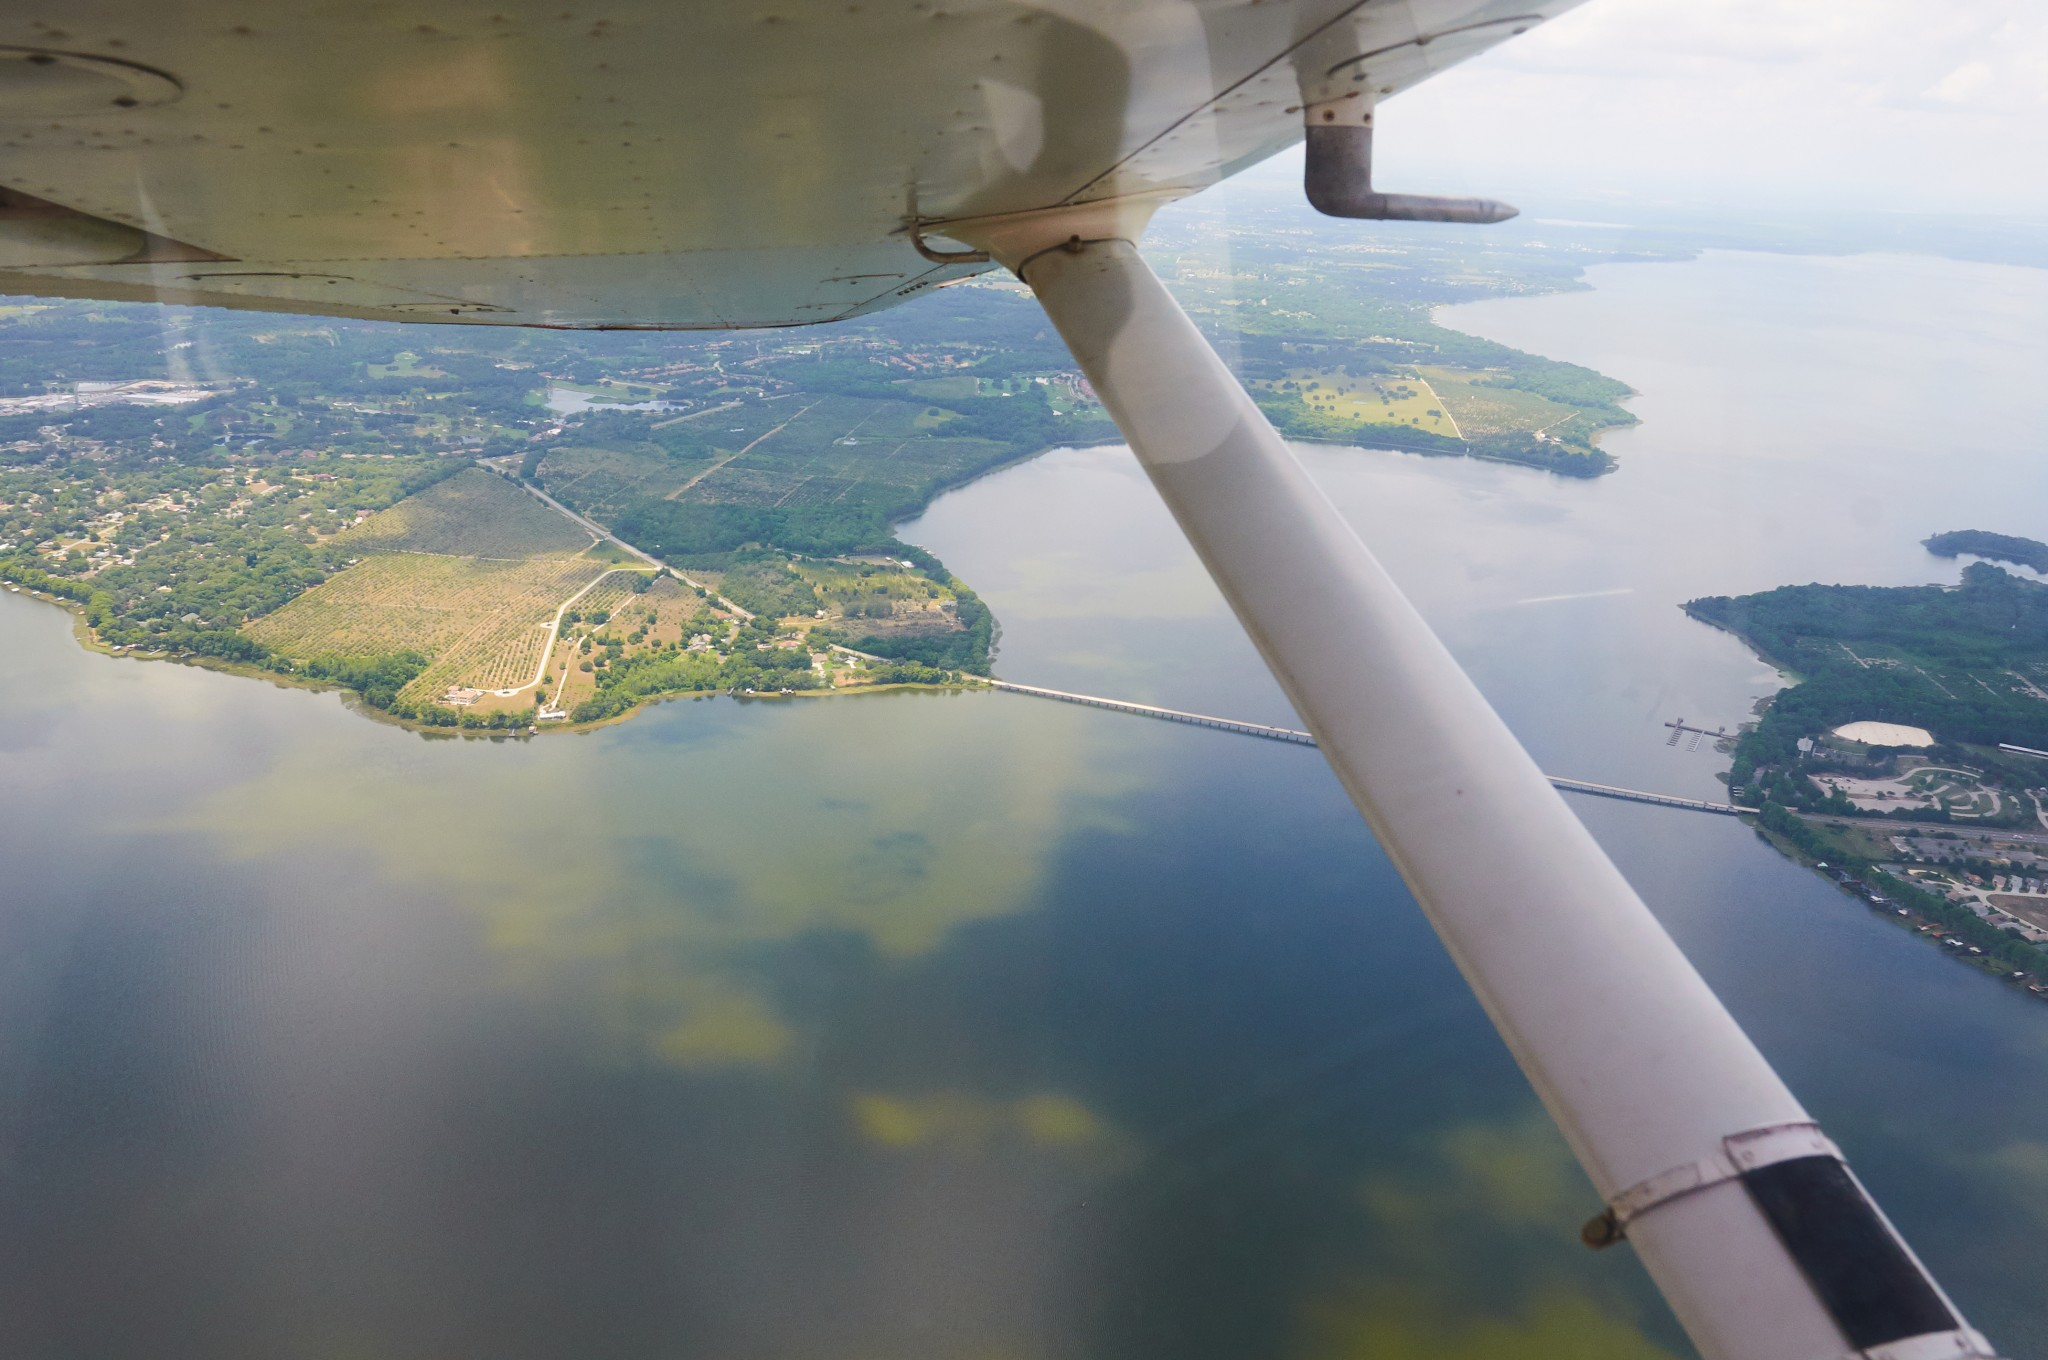 How we became private pilots in the United States. Pt.5 - Как мы учились в США на частных пилотов. Часть 5